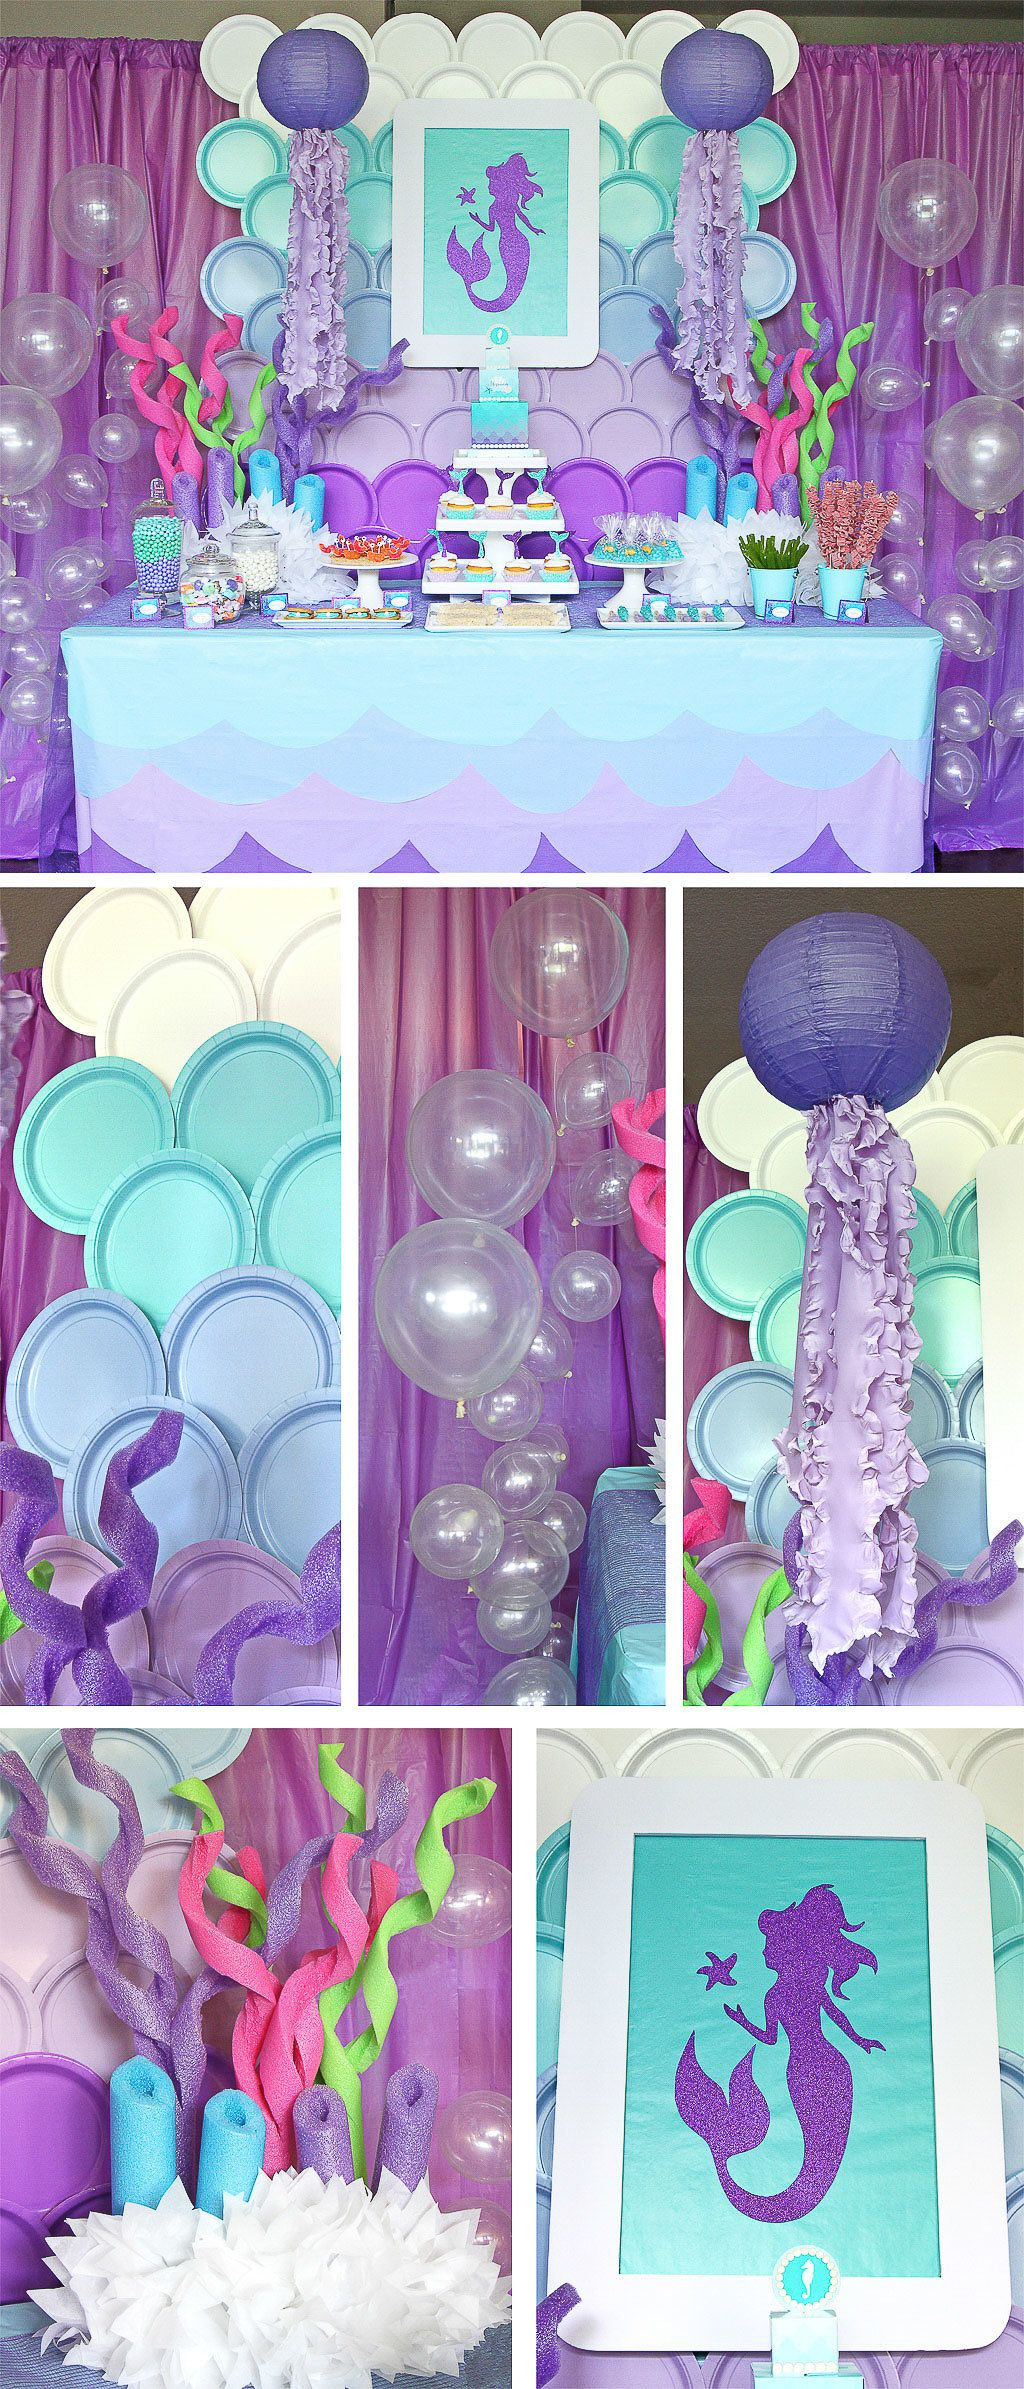 Little Mermaid Party Decoration Ideas  Mermaid Party Ideas